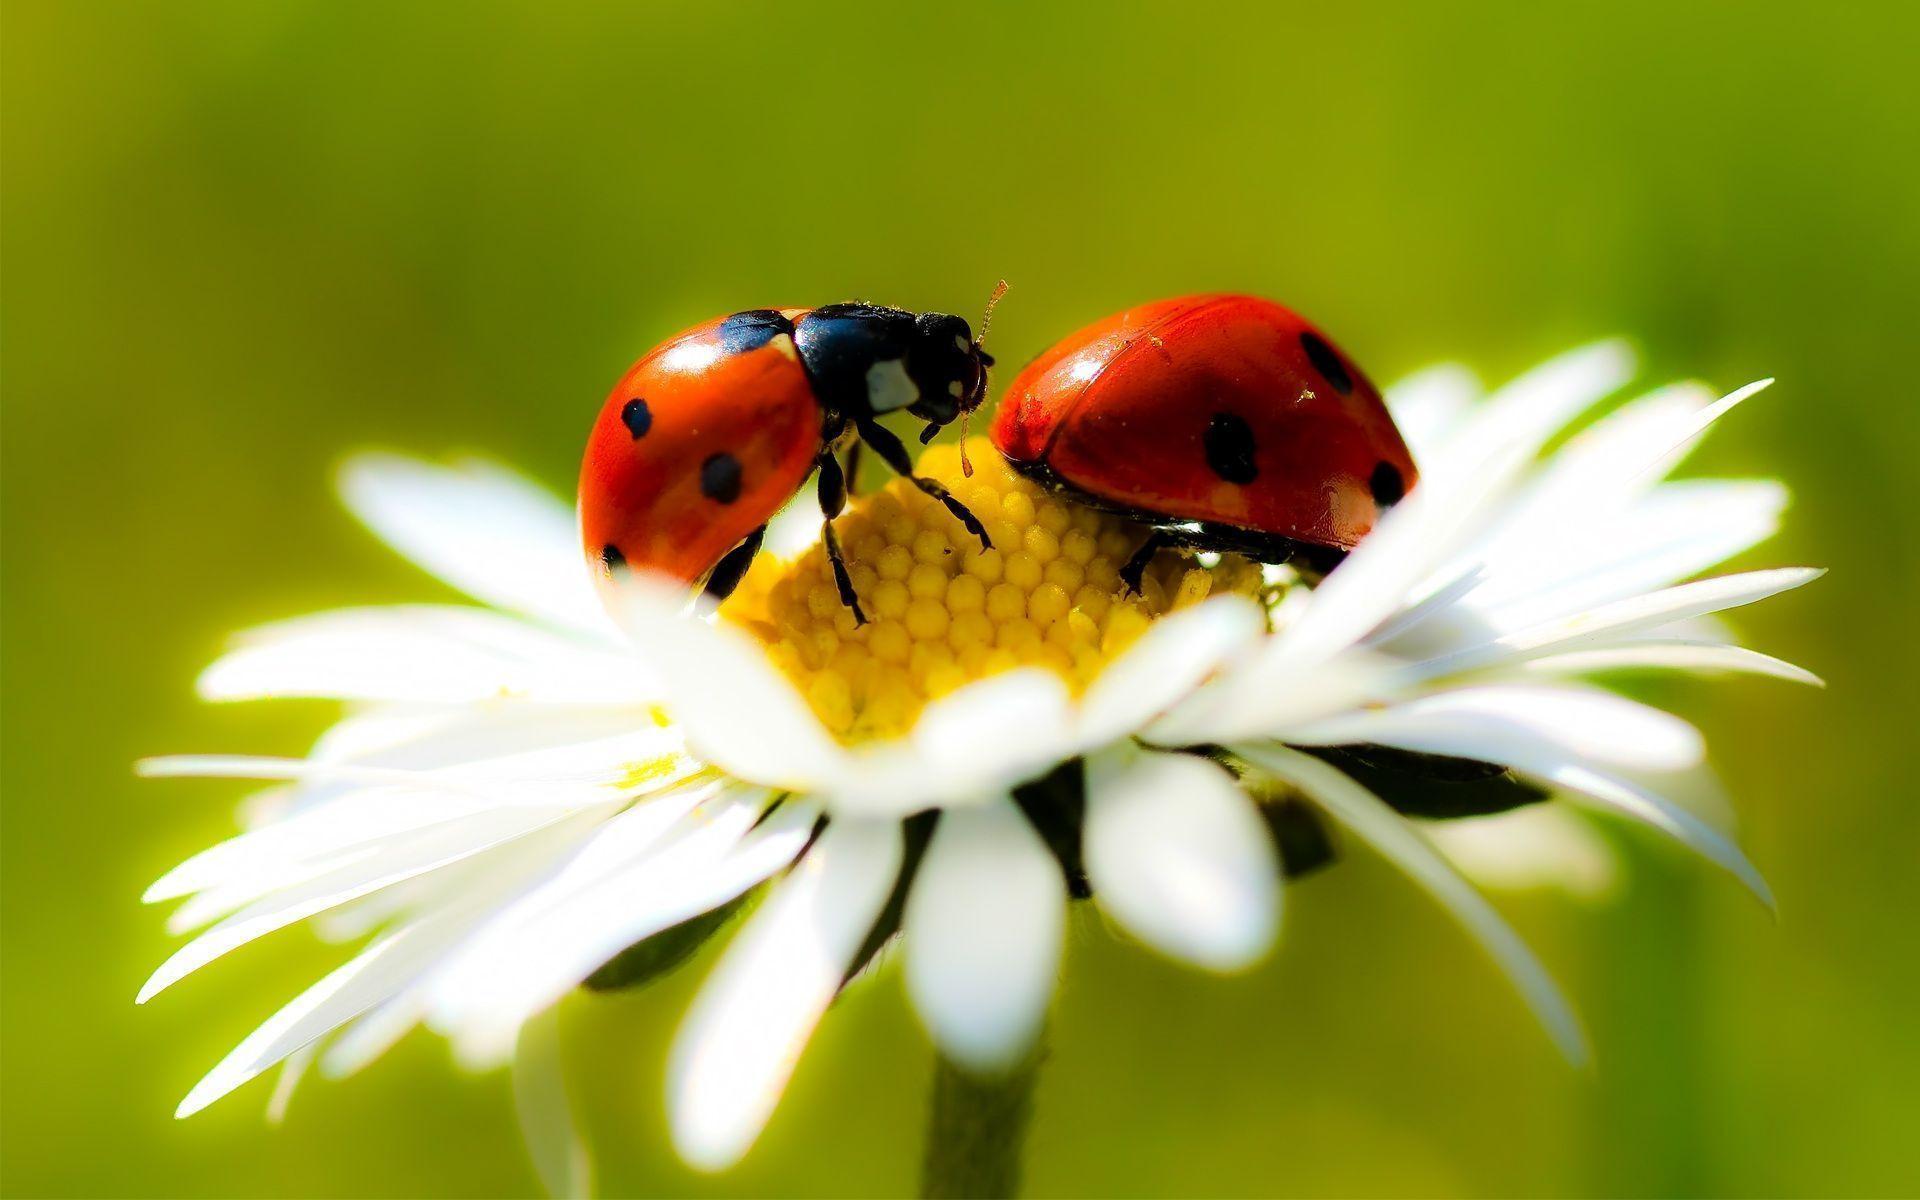 Ladybug Wallpapers - Wallpaper Cave